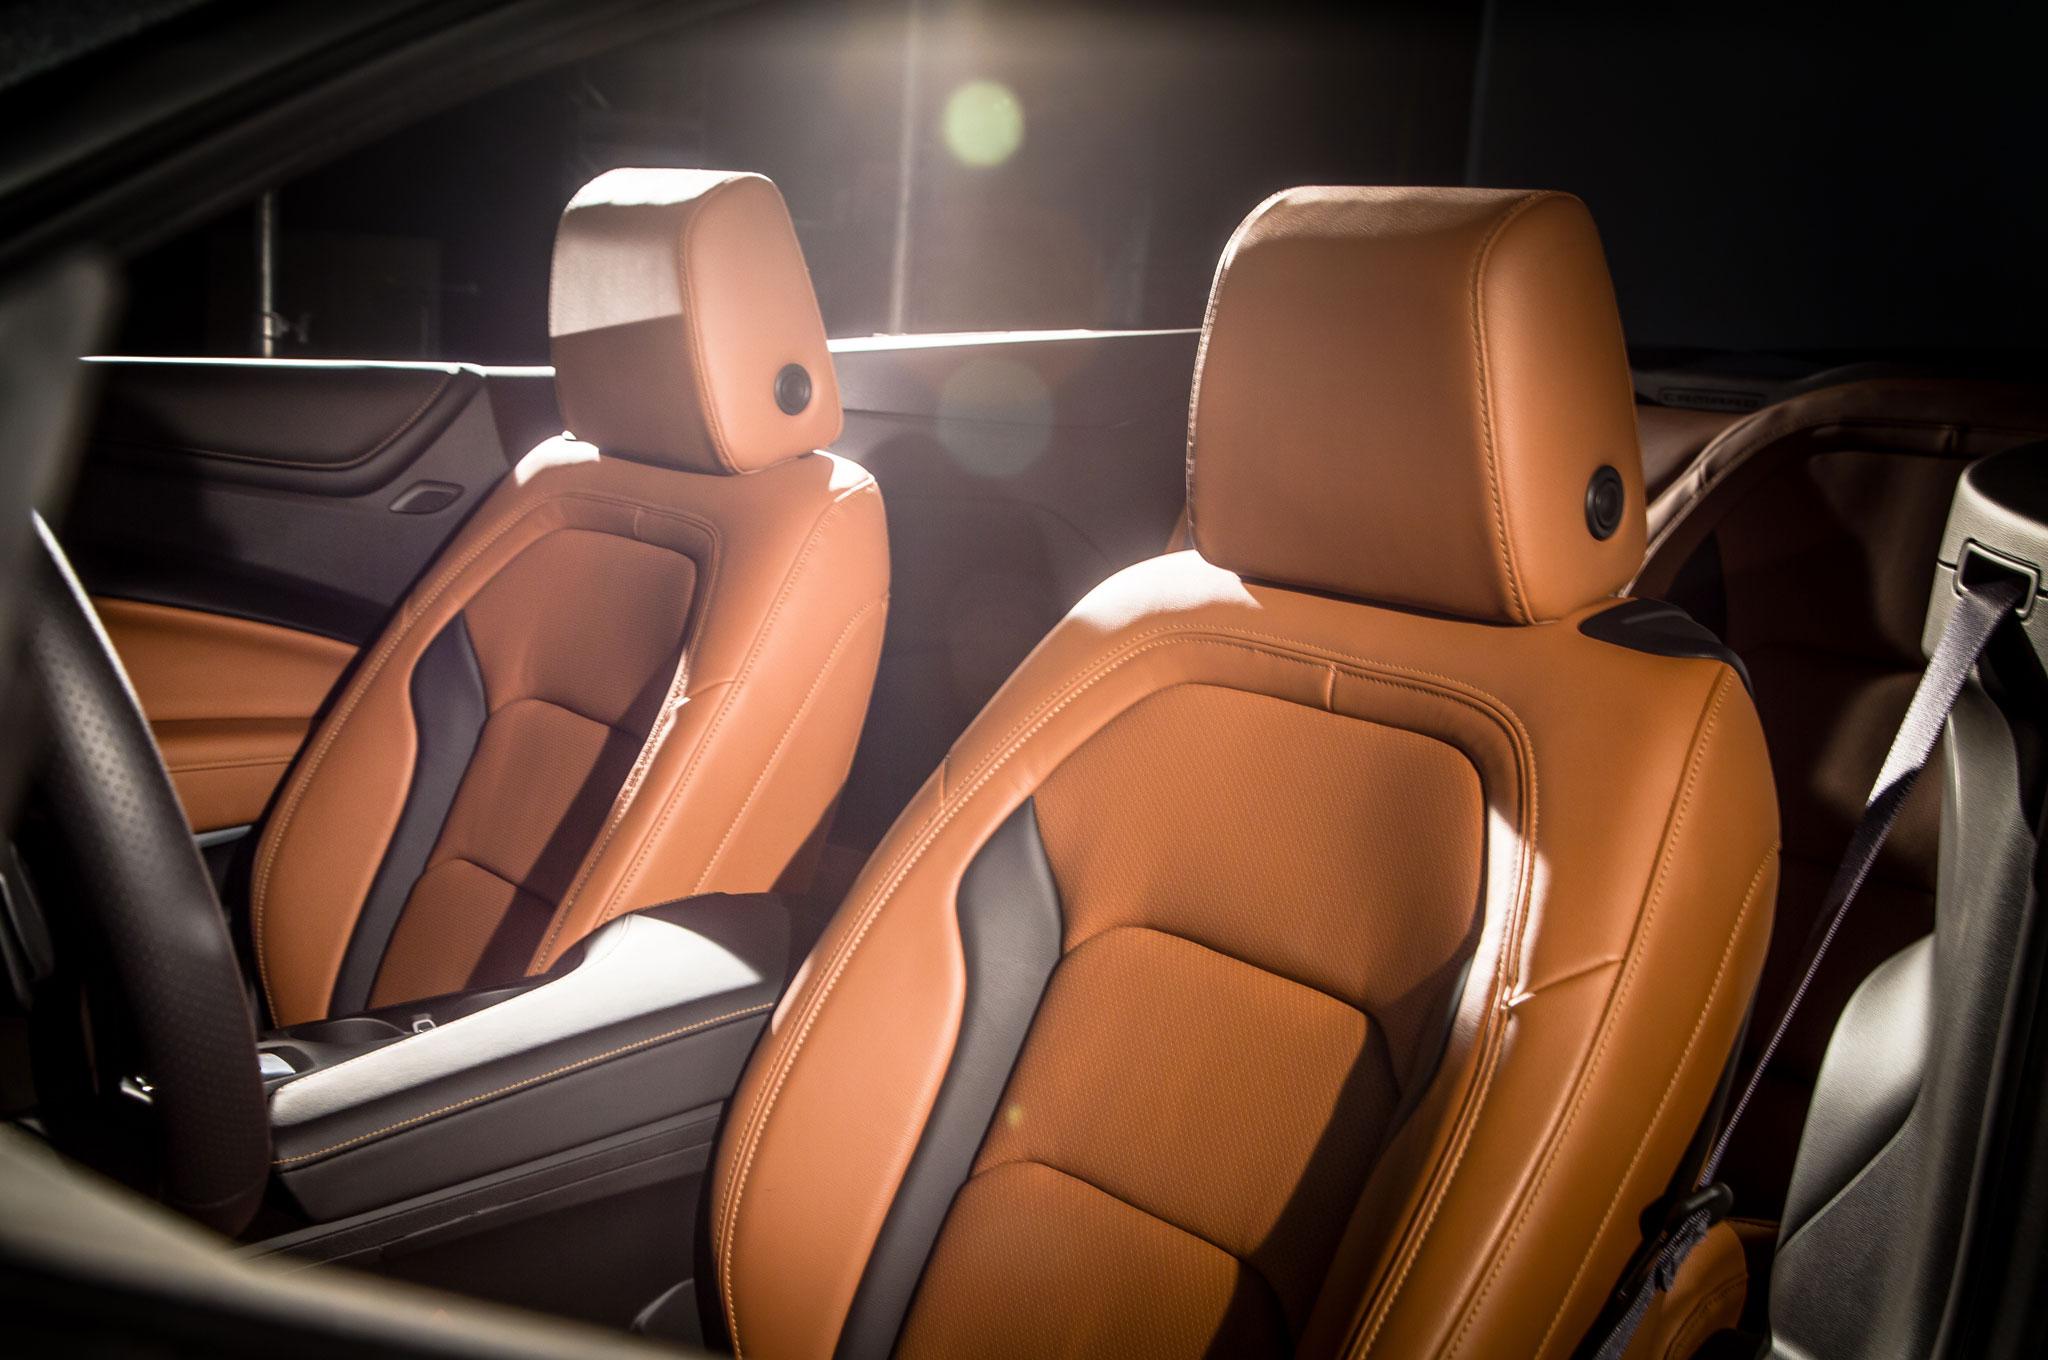 2016 Chevrolet Camaro Convertible Front Seats 5 107